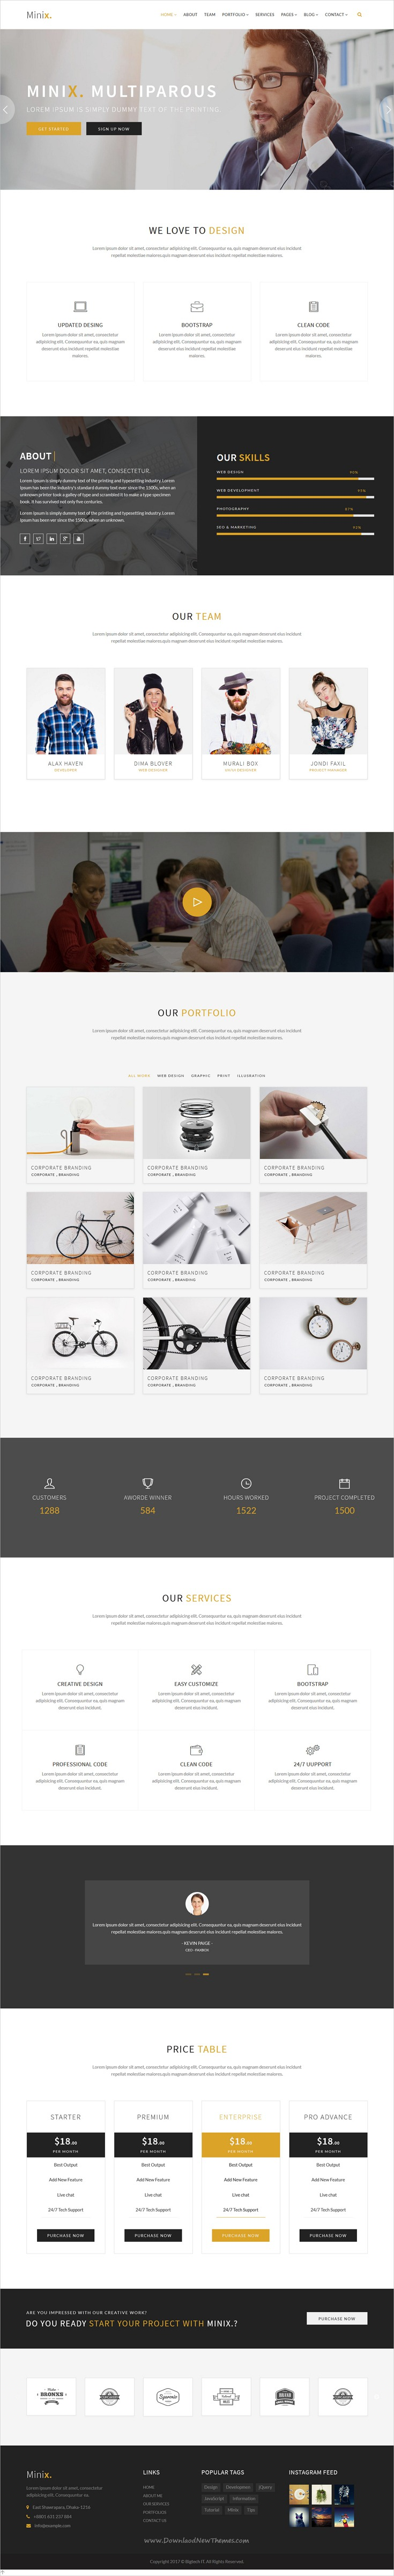 Minix. Multipurpose HTML5 Template | Business website